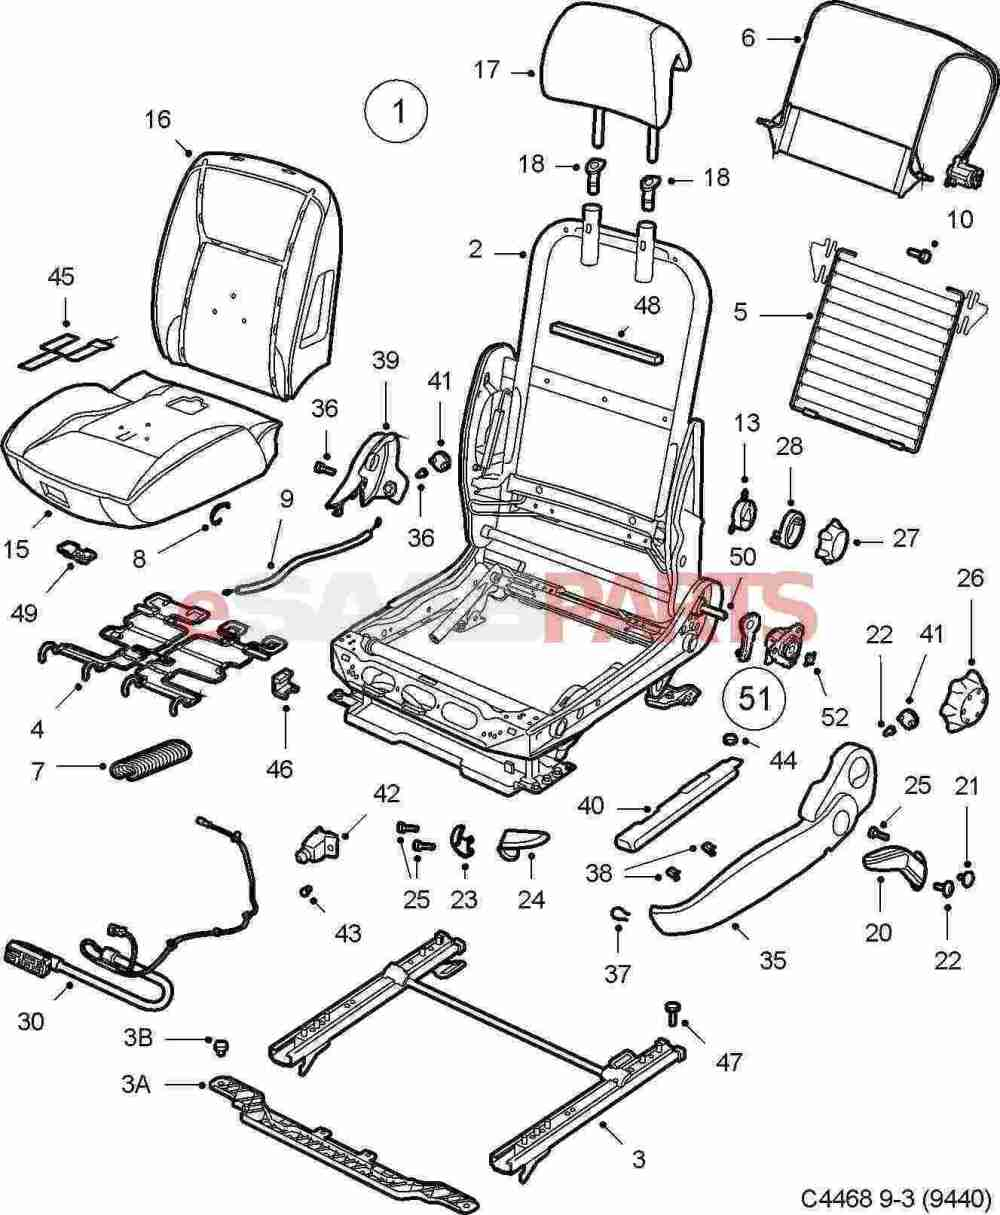 medium resolution of saab 9 3 seat diagram automotive wiring diagrams 2005 durango electric heated seats saab 9 3